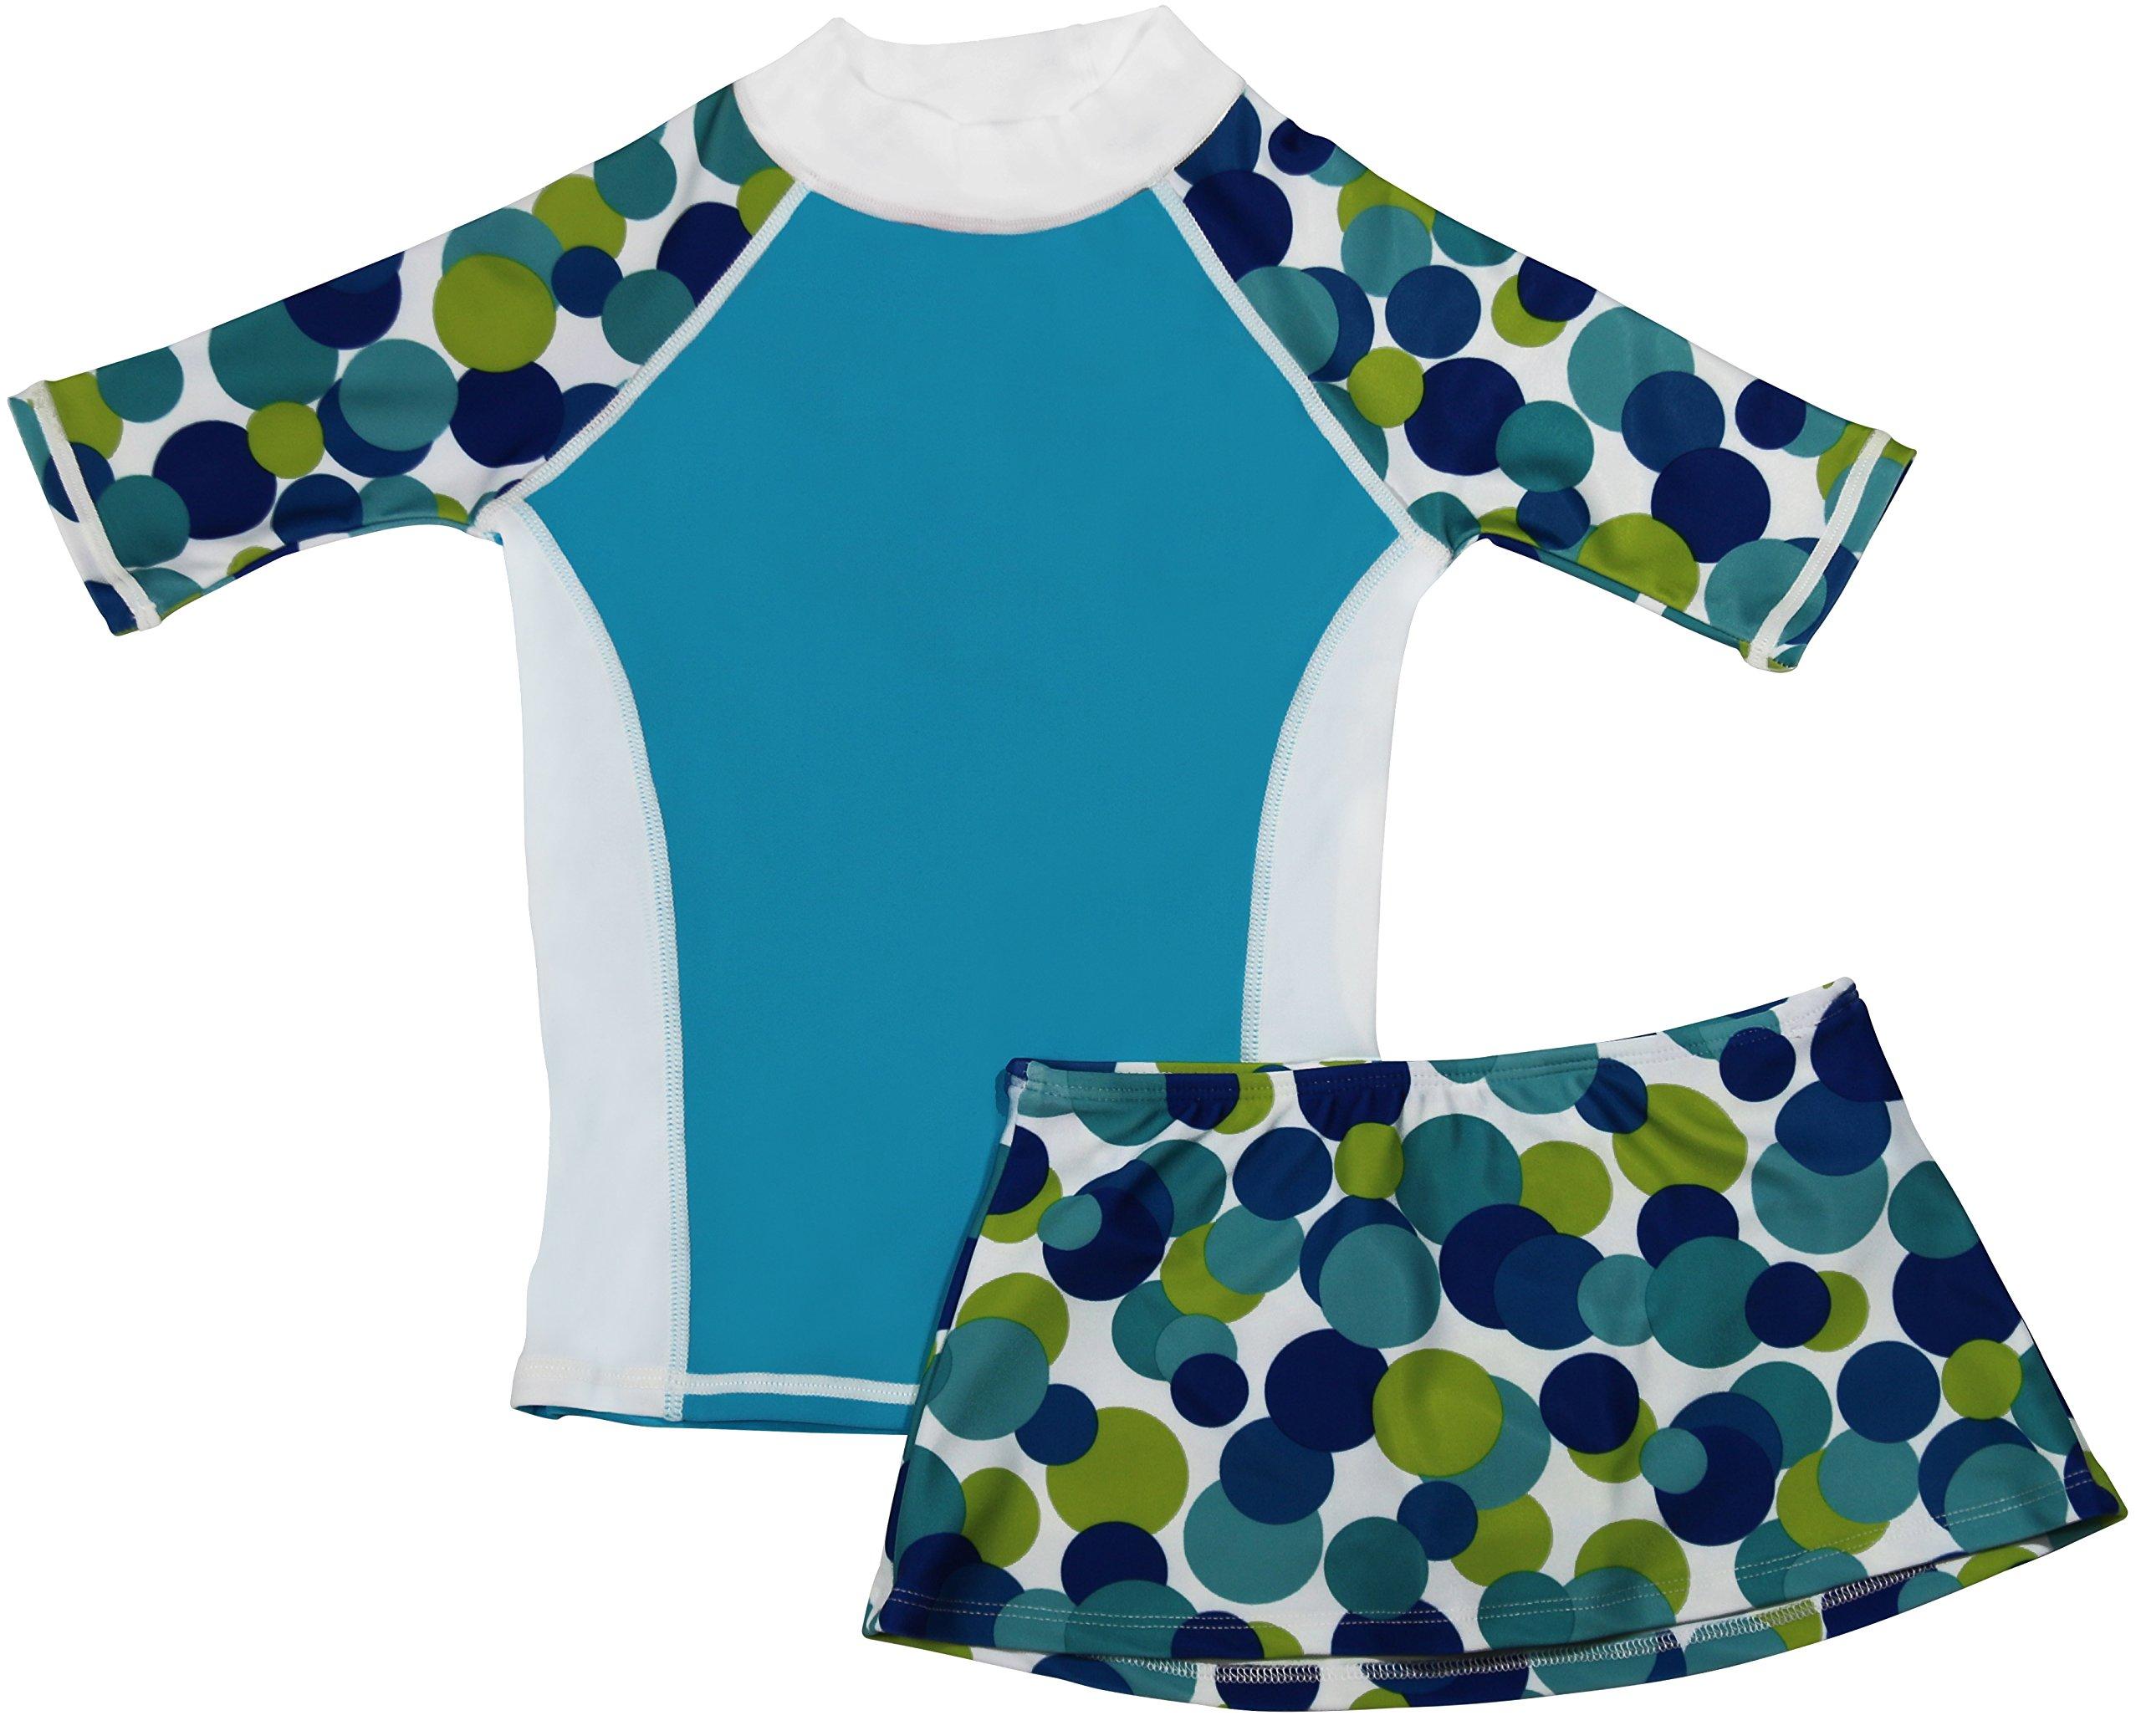 grUVywear Girls Short Sleeve UPF 50+ Rash Guard and Bikini Skirt Swimsuit Set - Love You Dots   9-10